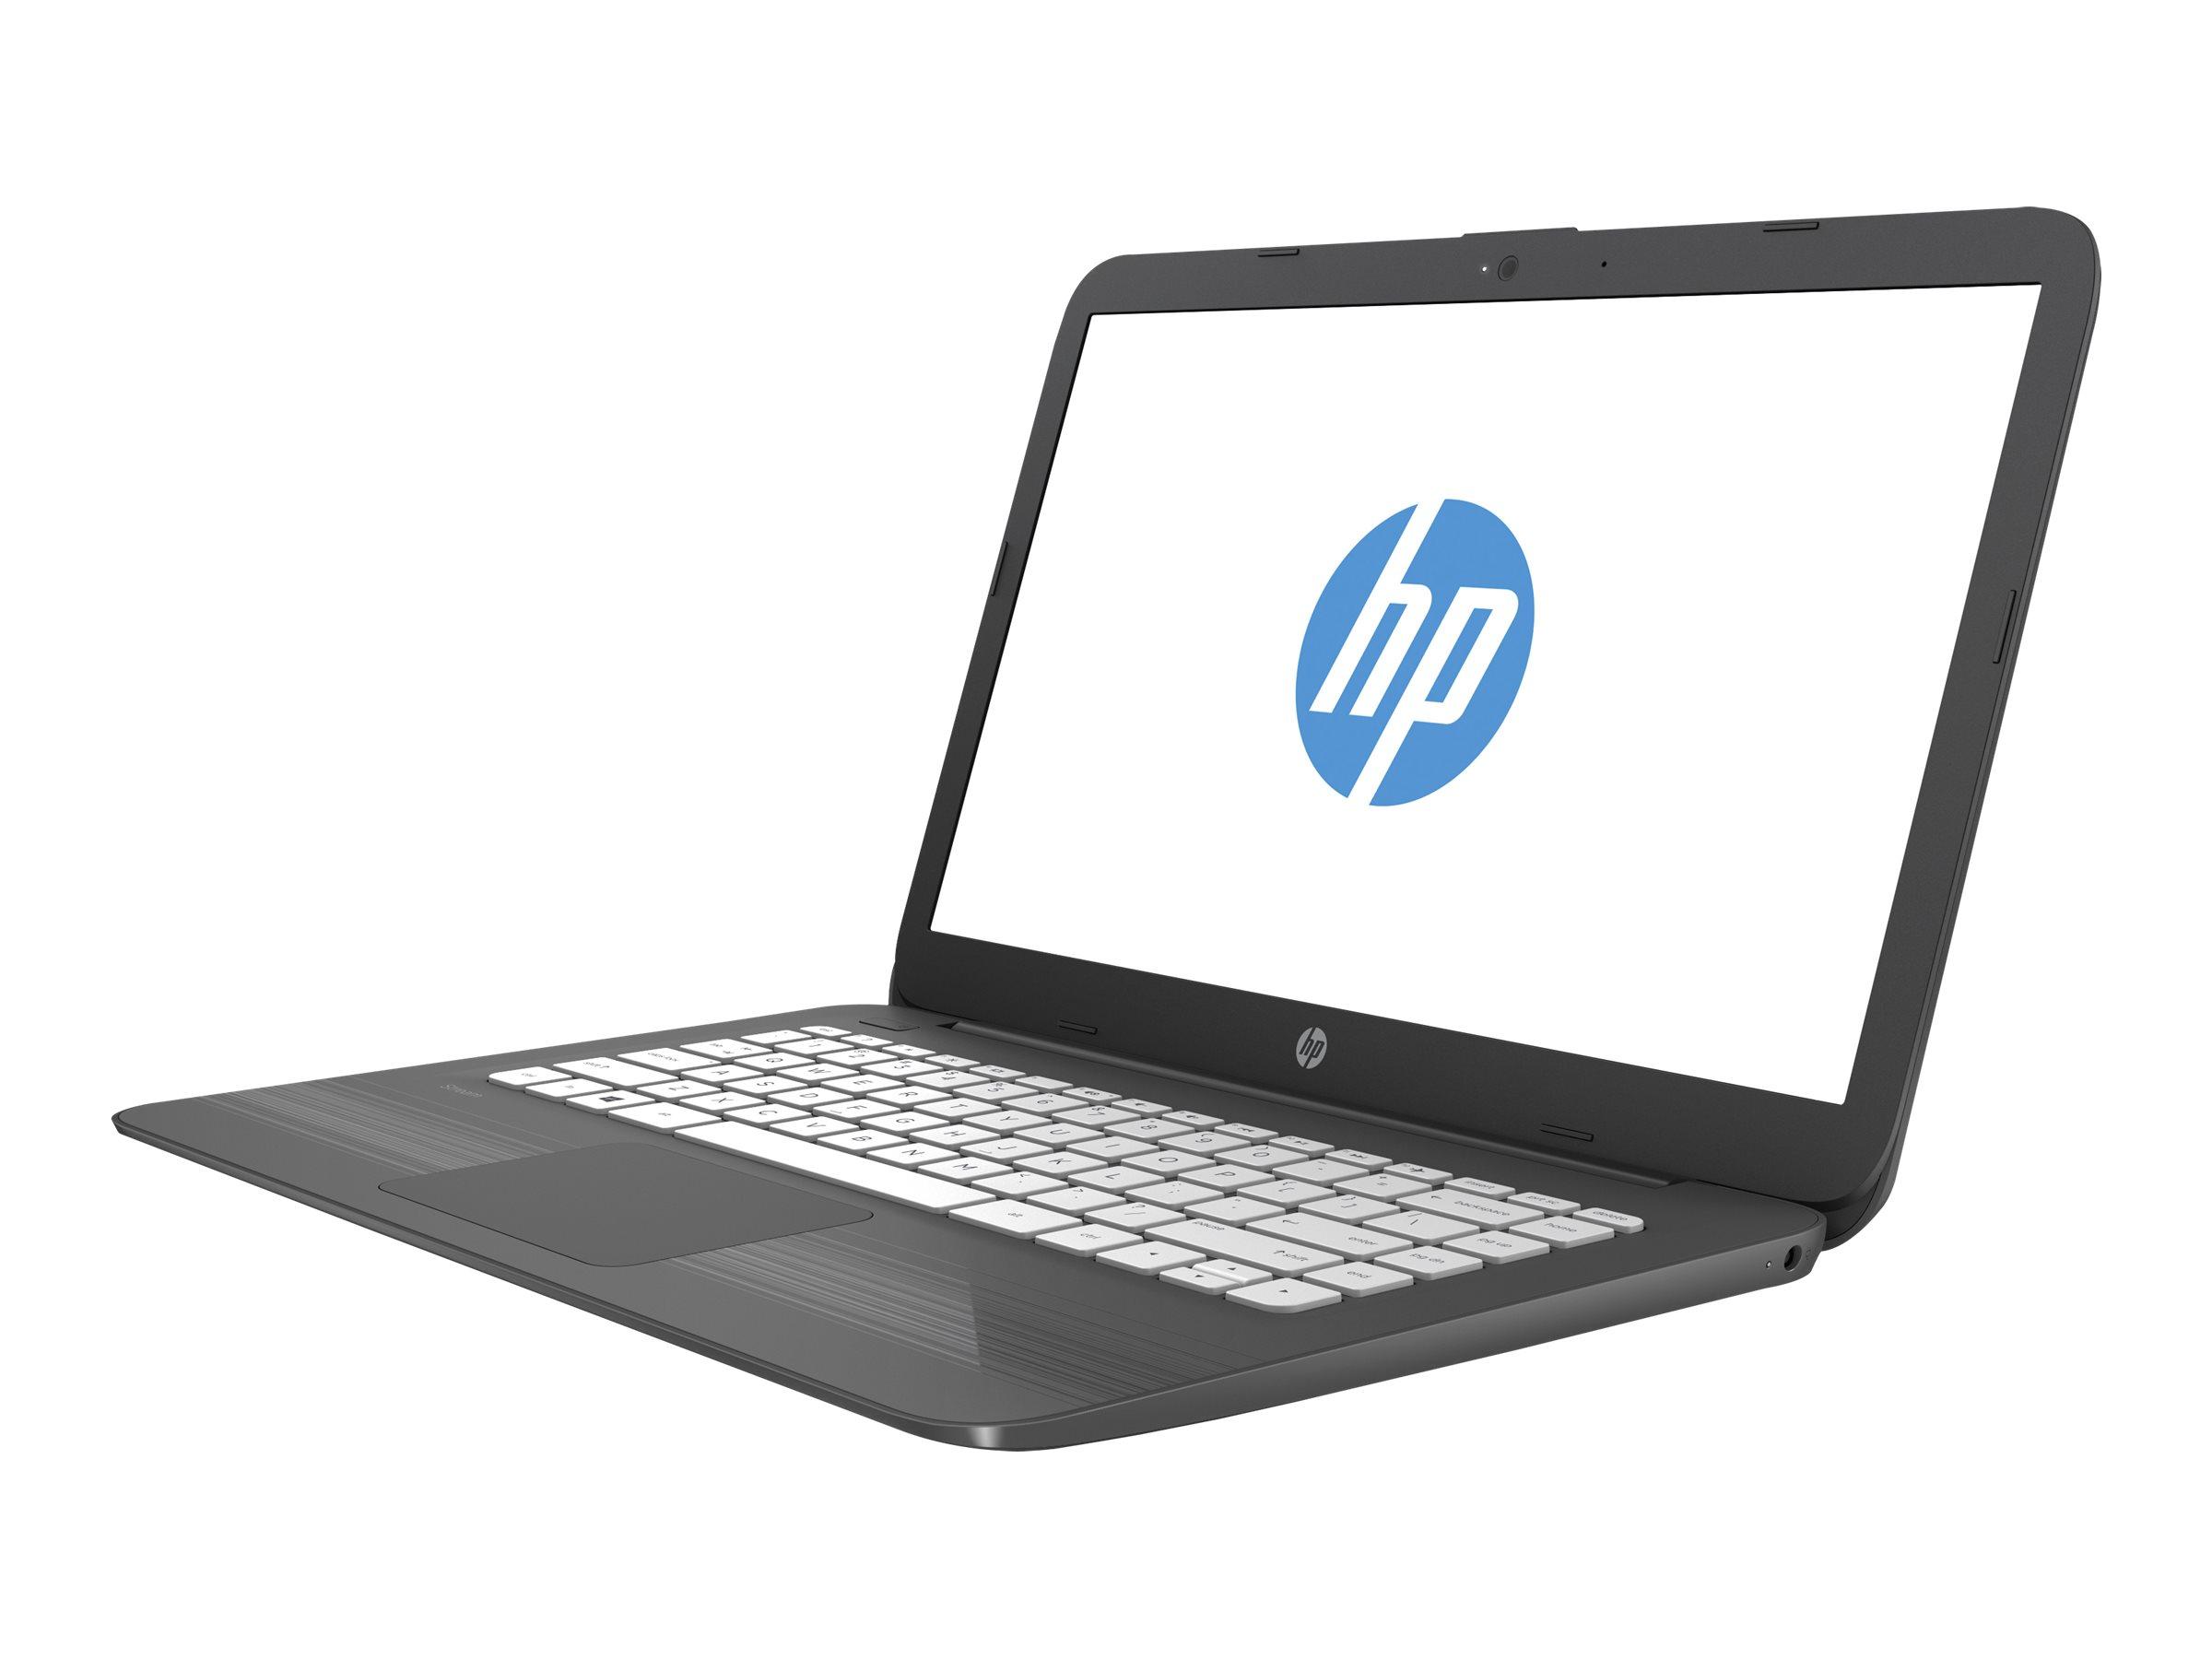 "HP Stream - 14-ax002ng - 14"" Notebook - Celeron 2,48 GHz 35,6 cm"